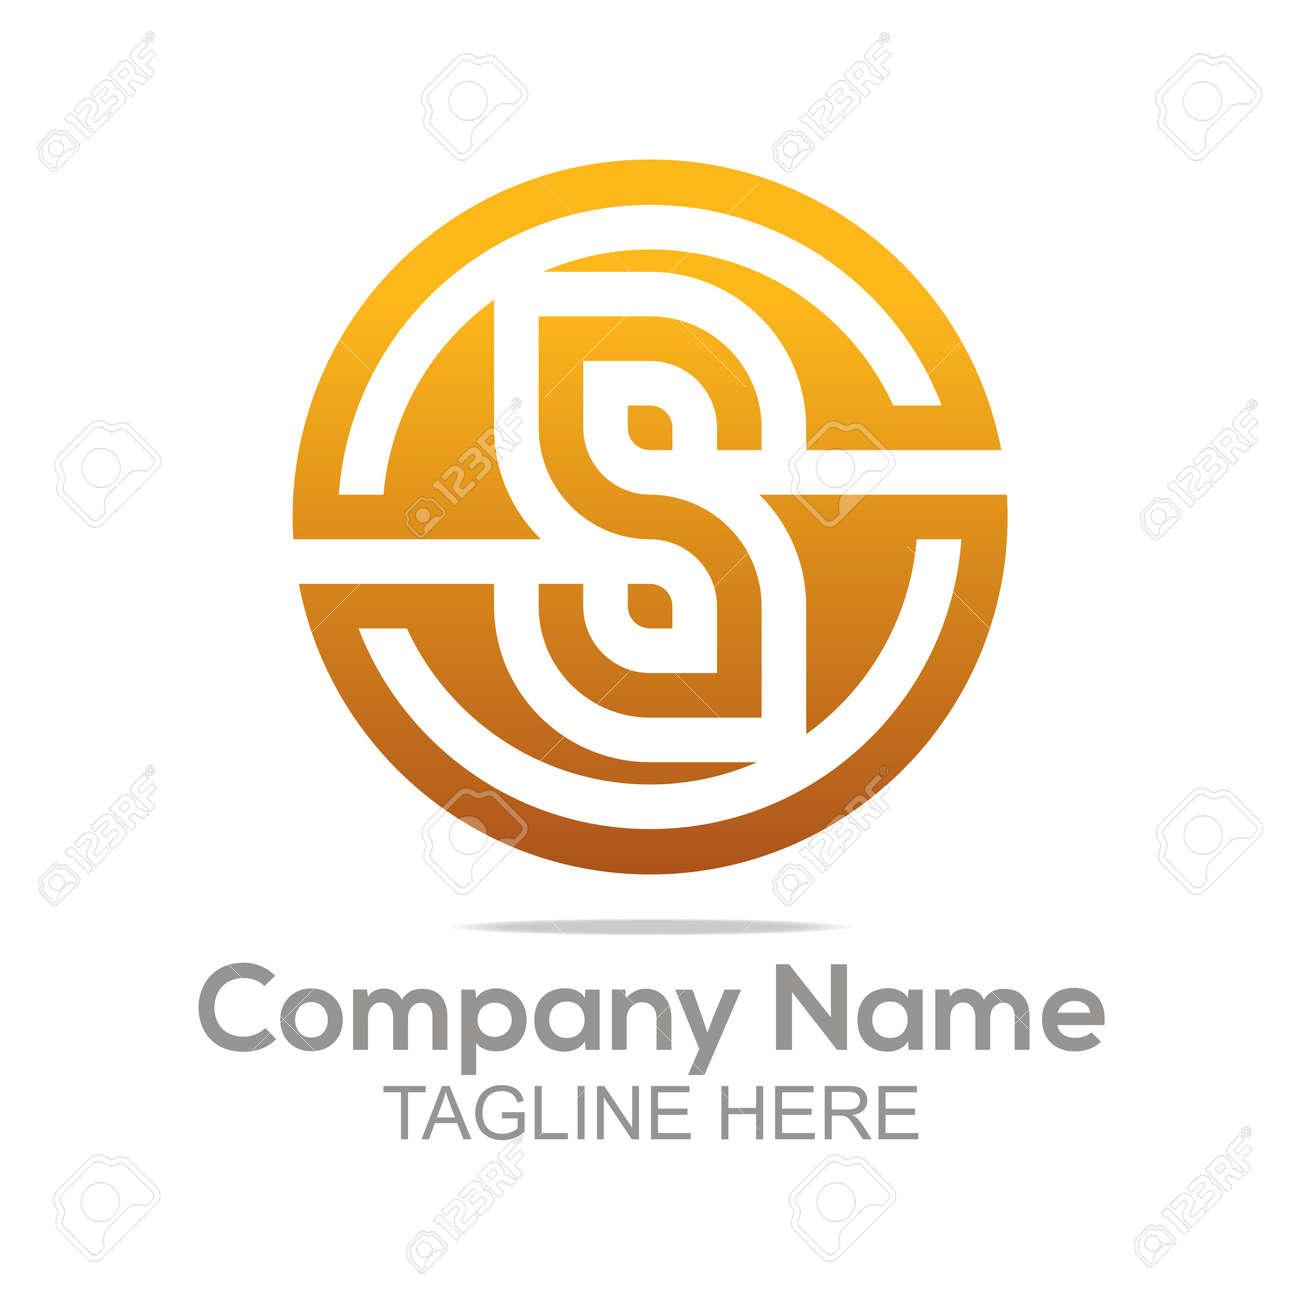 Logo design company name letter s infinity connecting symbol logo design company name letter s infinity connecting symbol icon abstract vector stock vector 45283498 buycottarizona